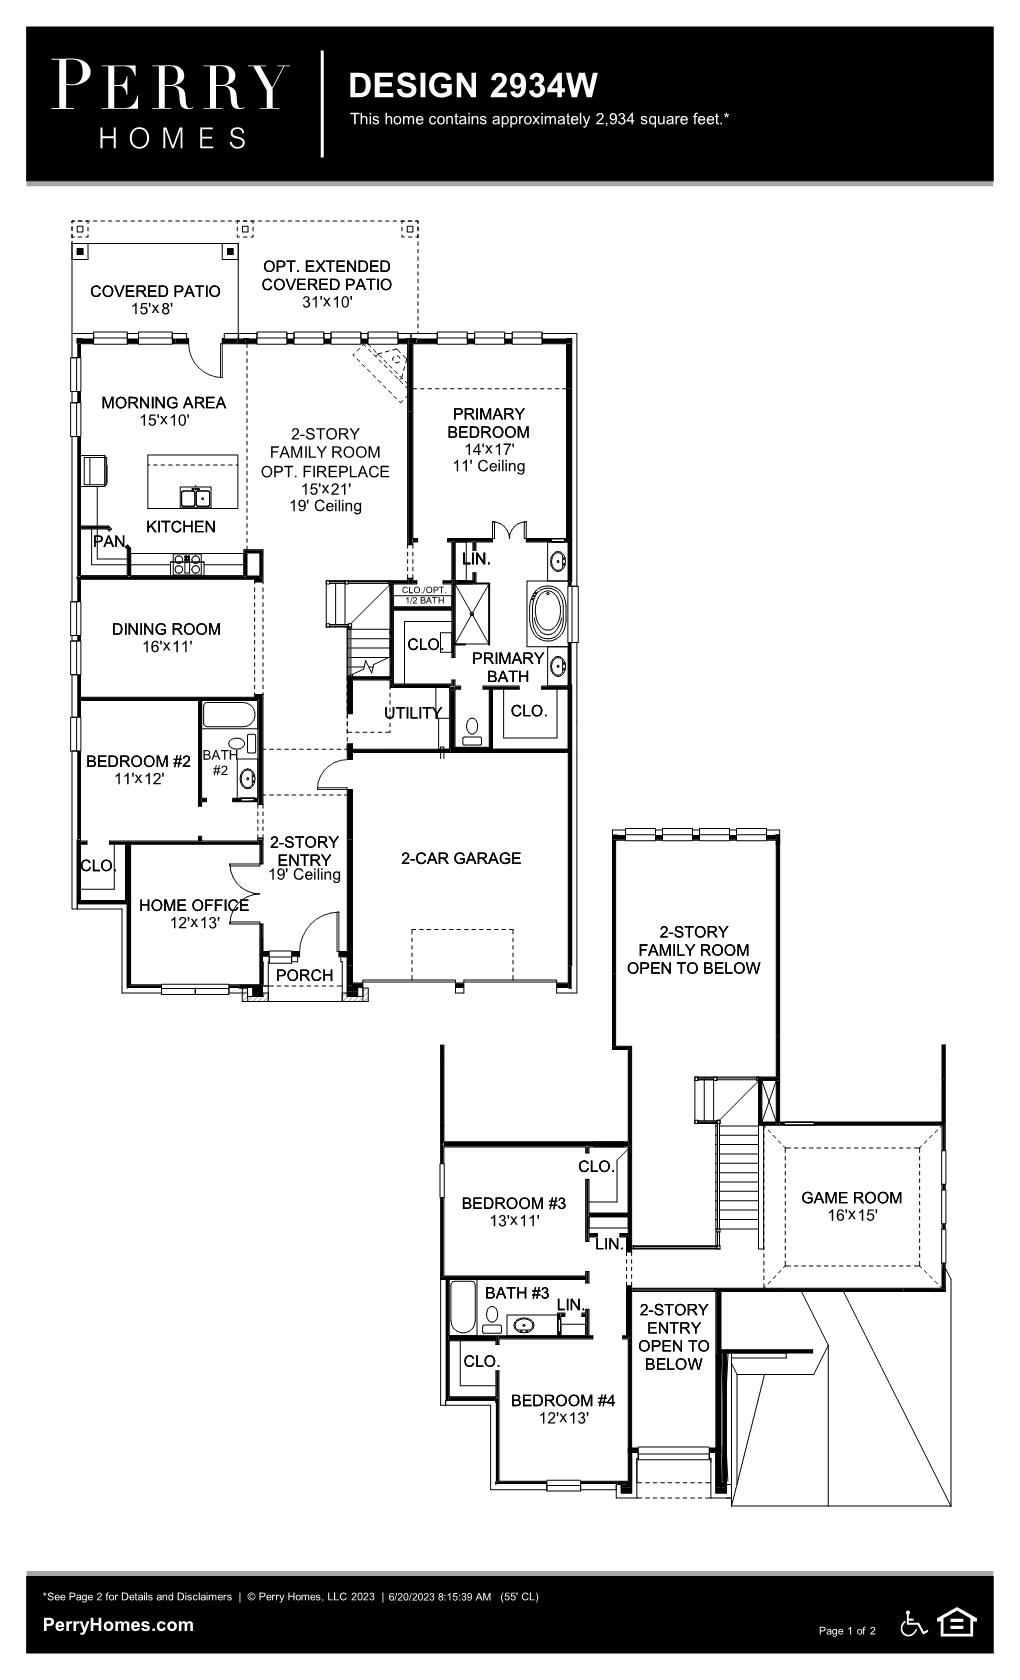 Floor Plan for 2934W